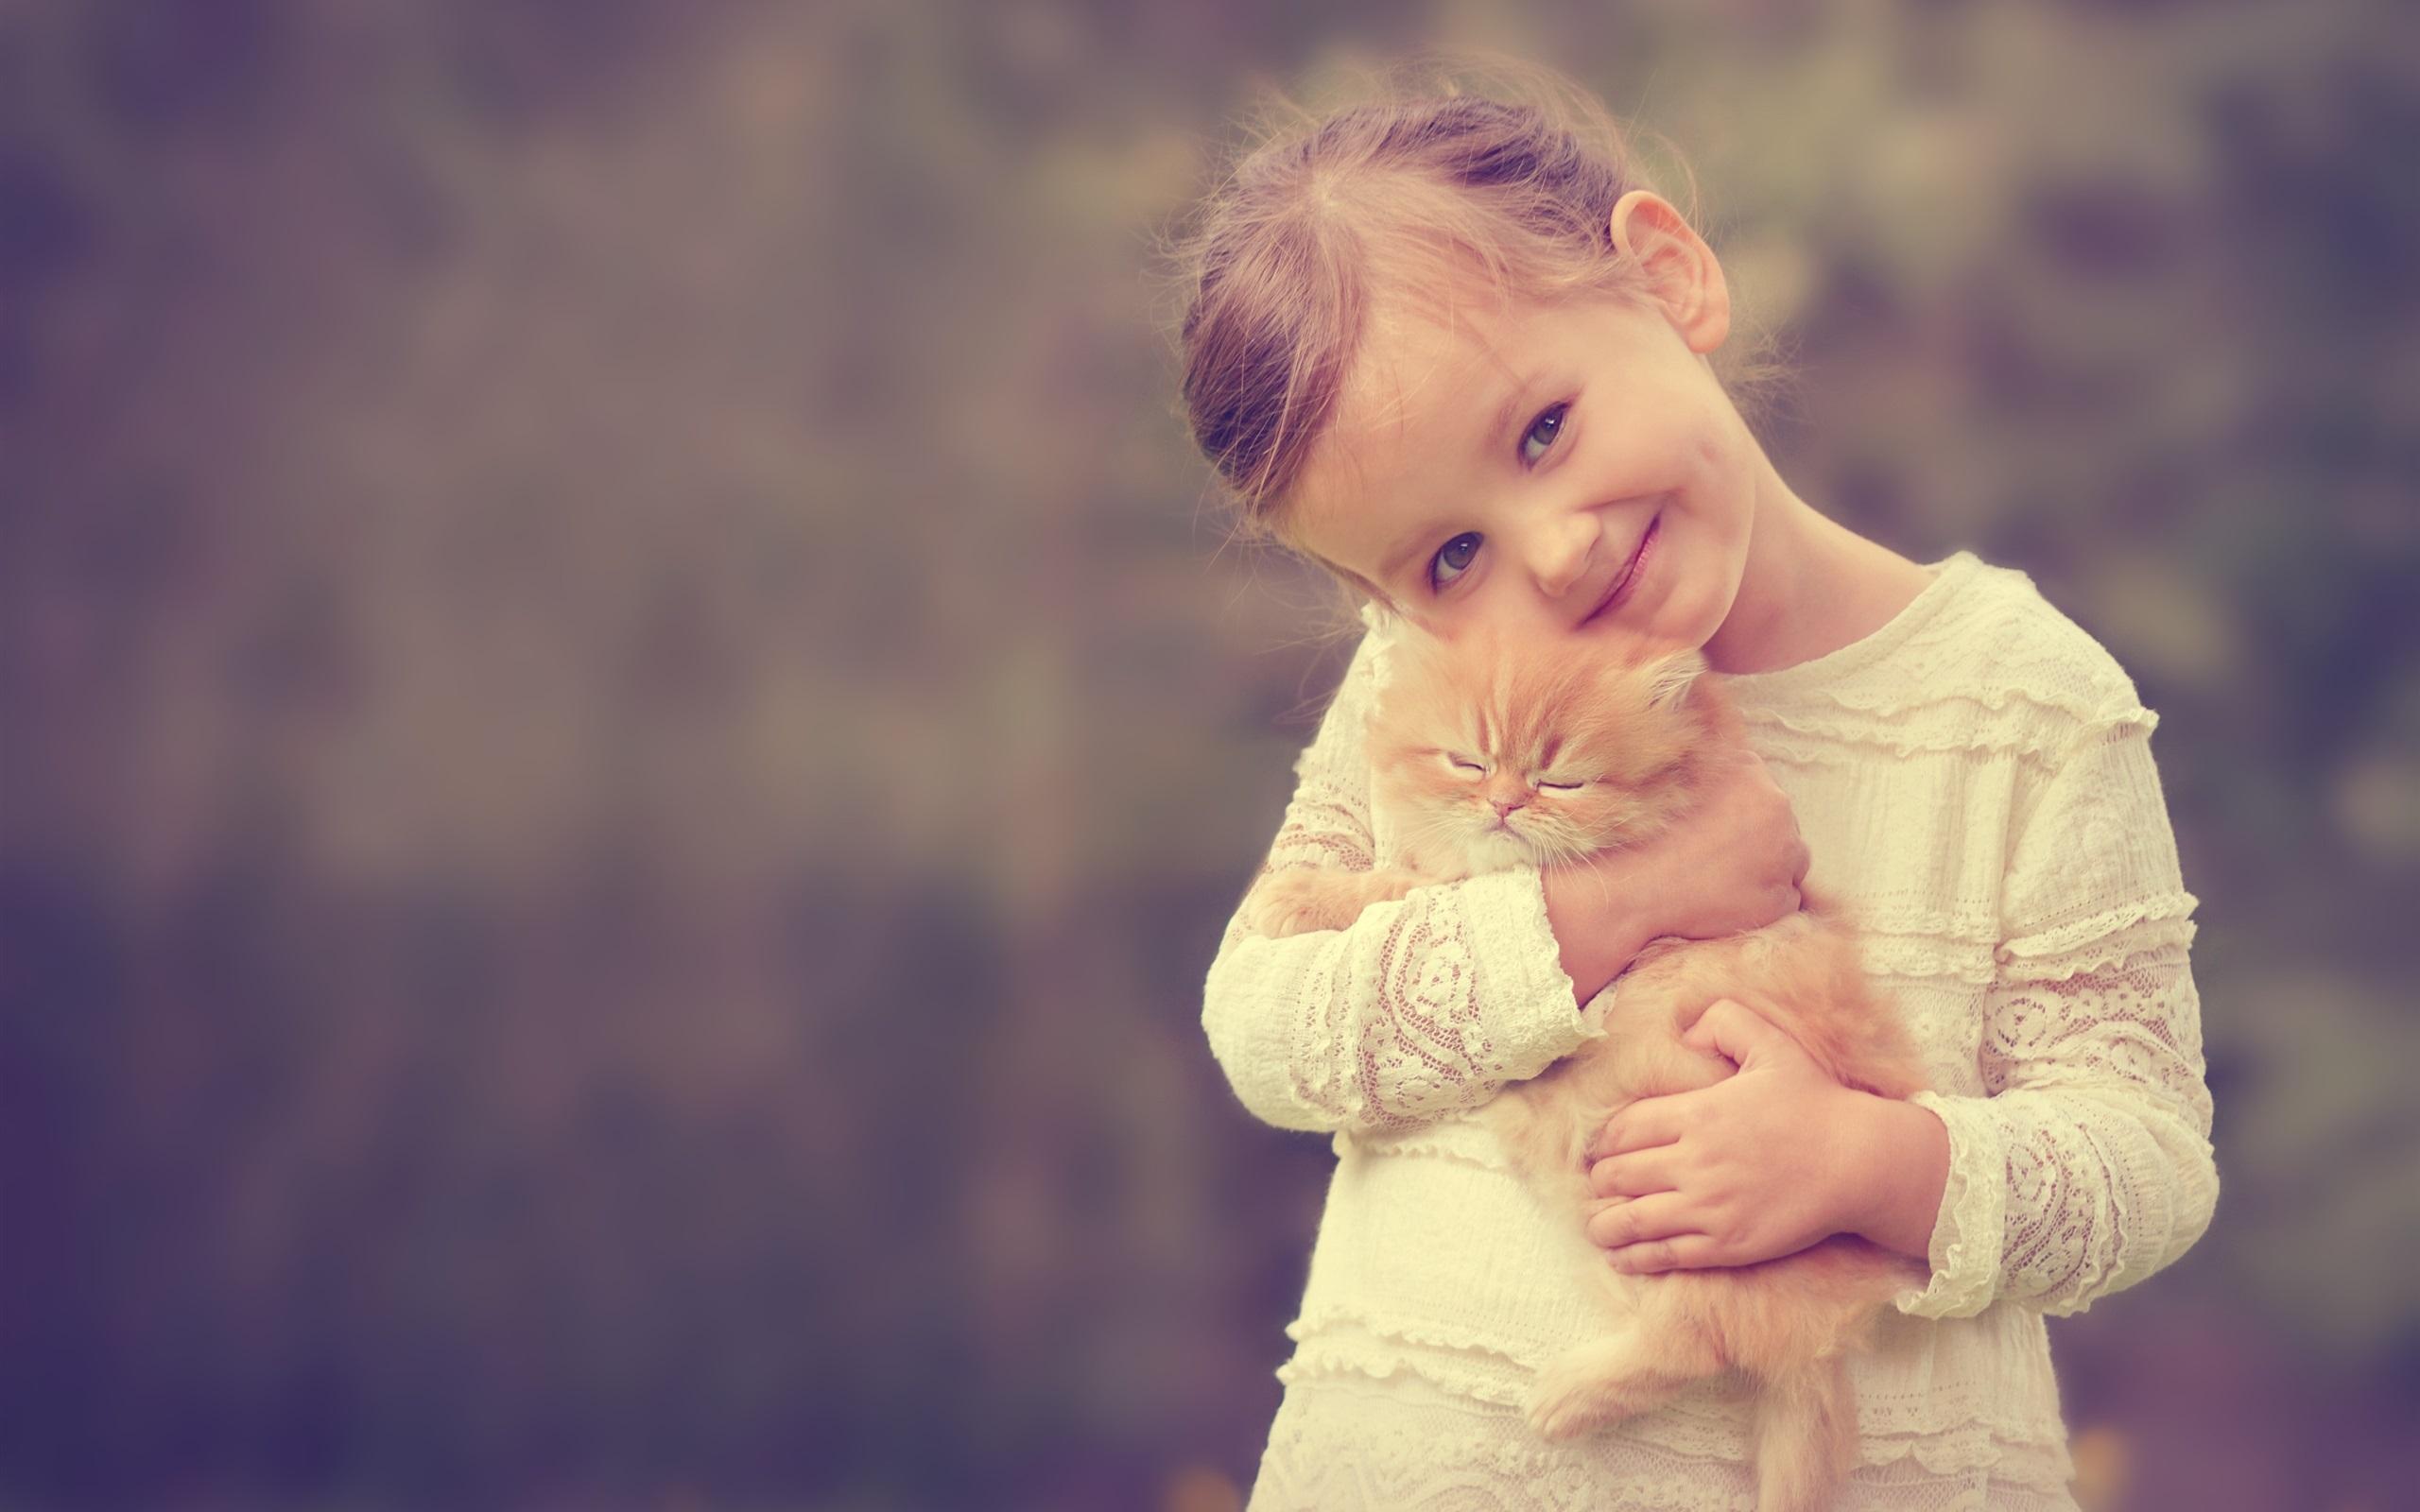 Cute Little Girl Wallpaper Download Cute Girl Holding A Cat Smile Wallpaper Cute